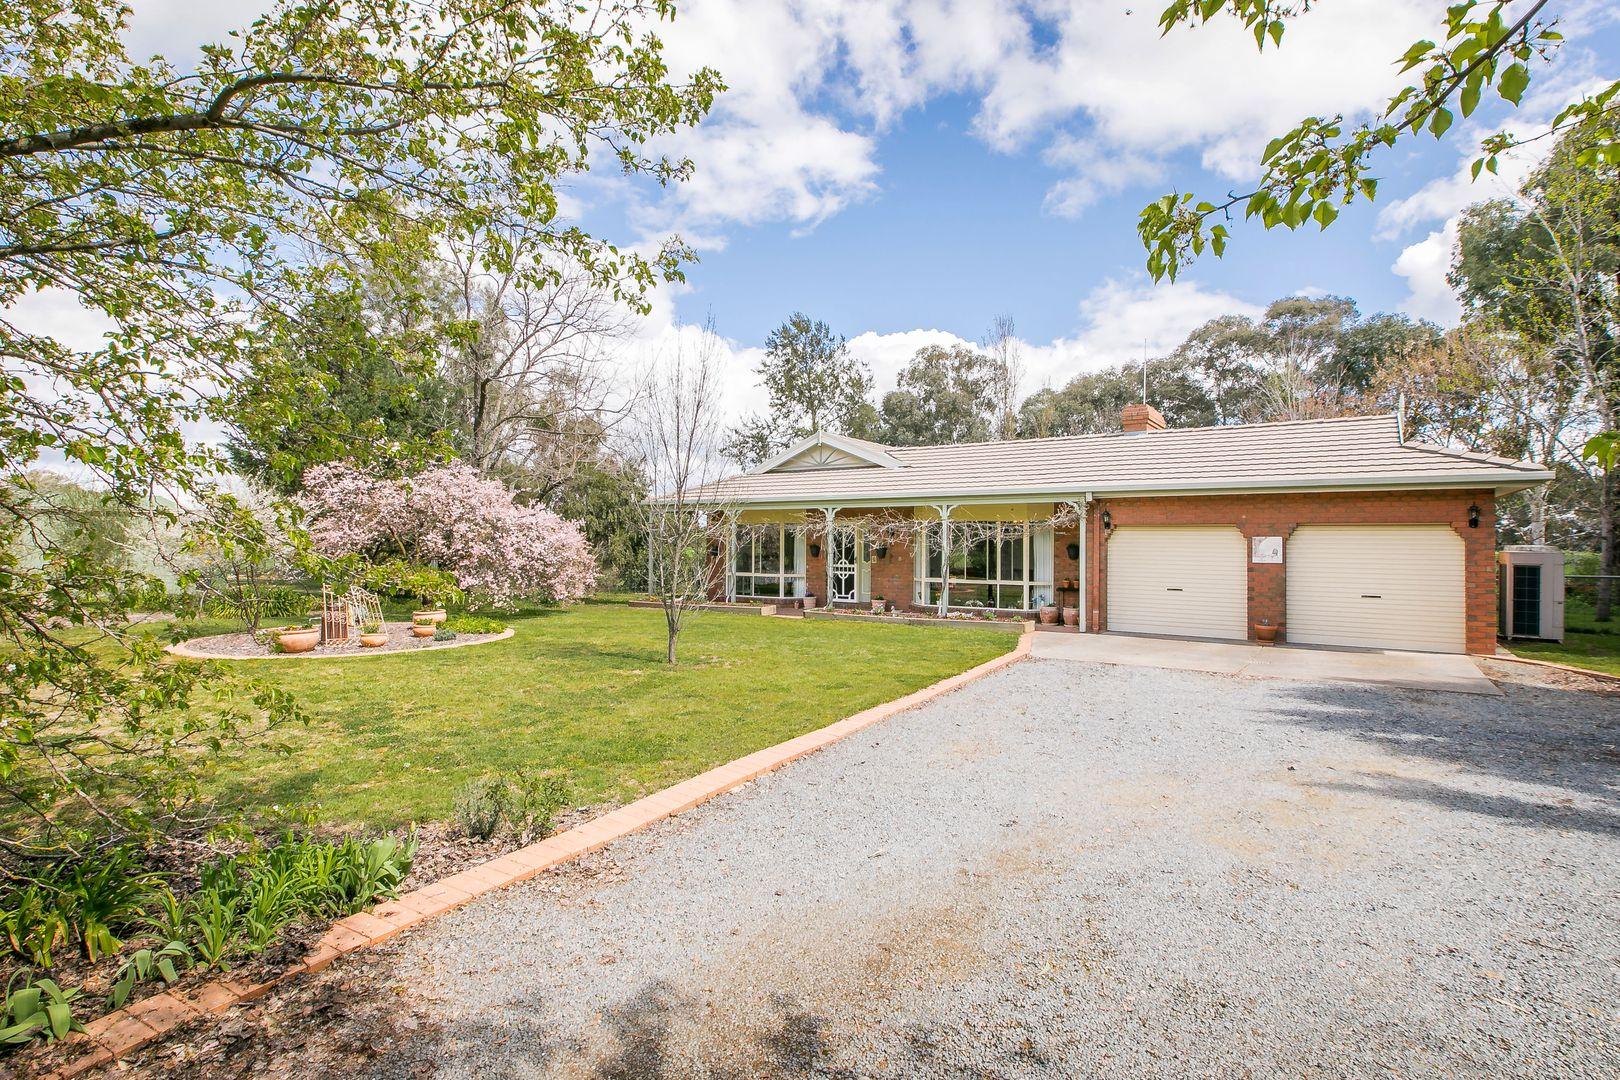 2177 Culcairn Holbrook Road, Morven NSW 2660, Image 0